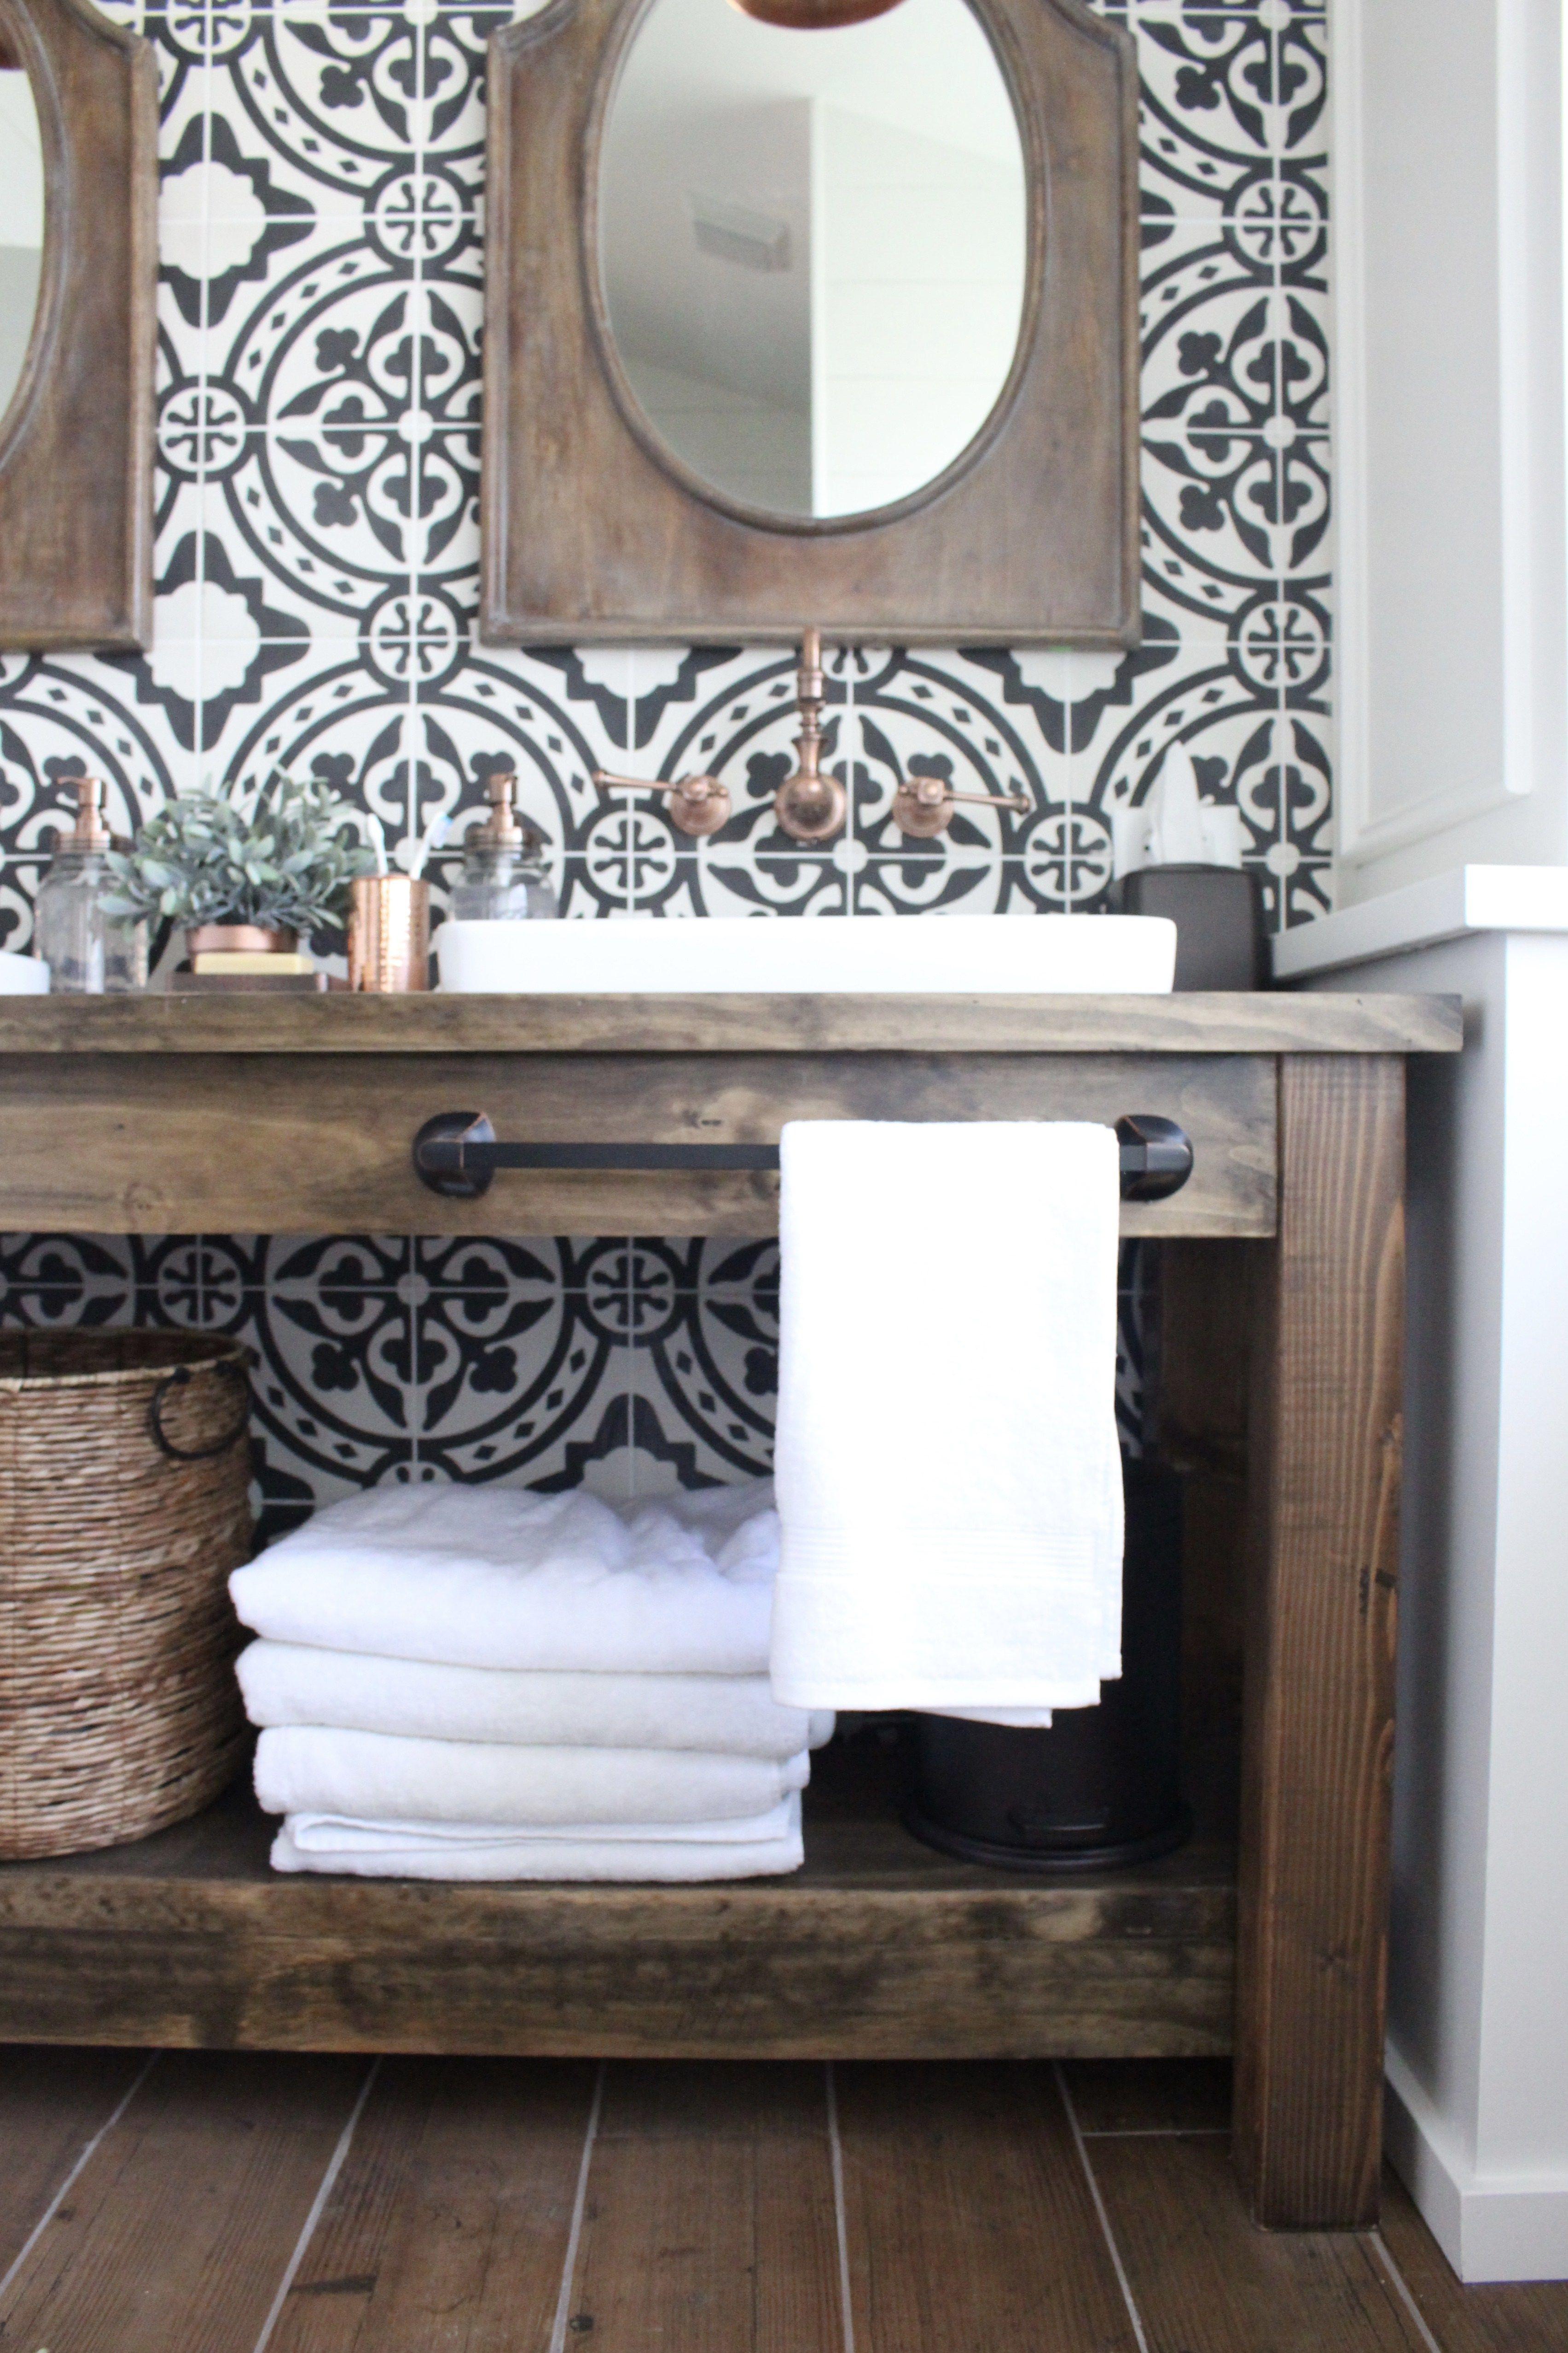 Luxury Bathroom Tile Patterns Ideas Farmhouse style bathrooms